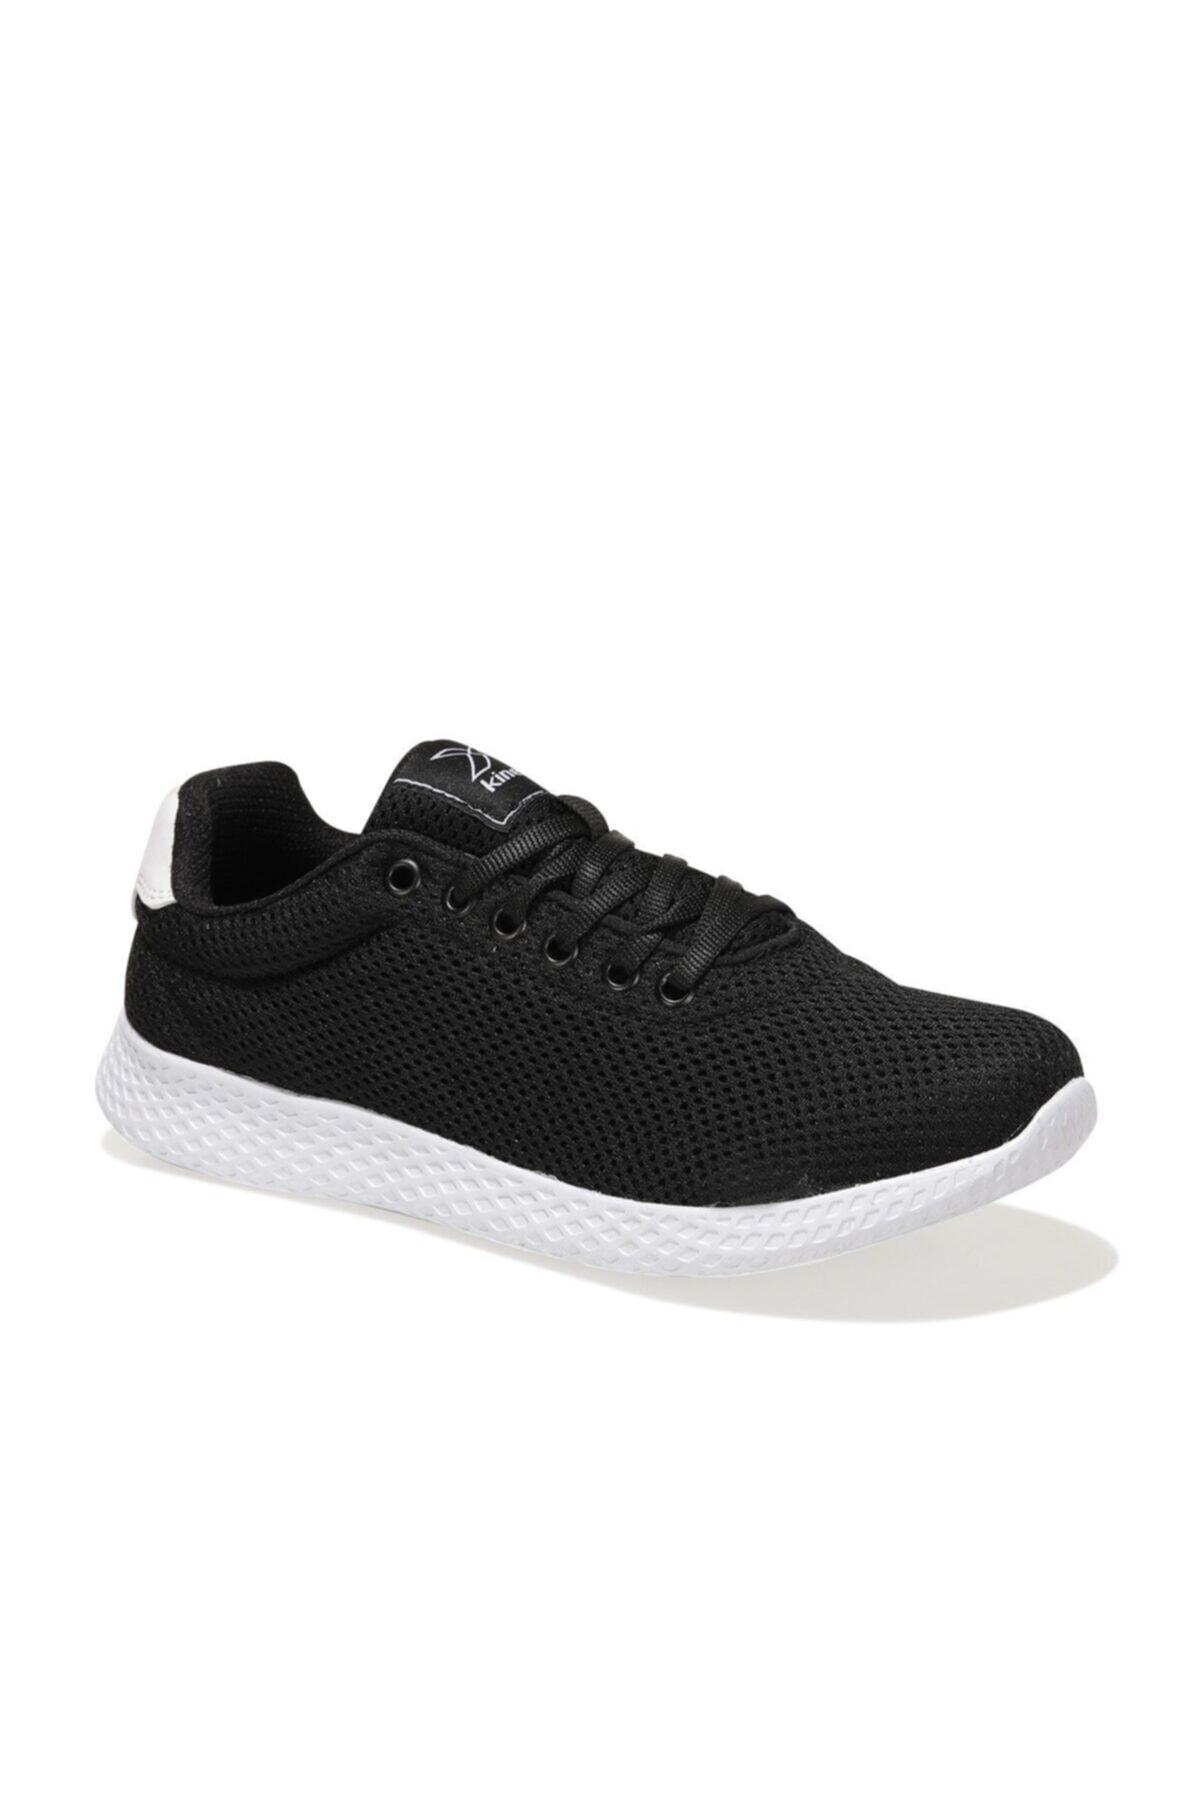 AREL MESH M 1FX Siyah Erkek Sneaker Ayakkabı 100781977